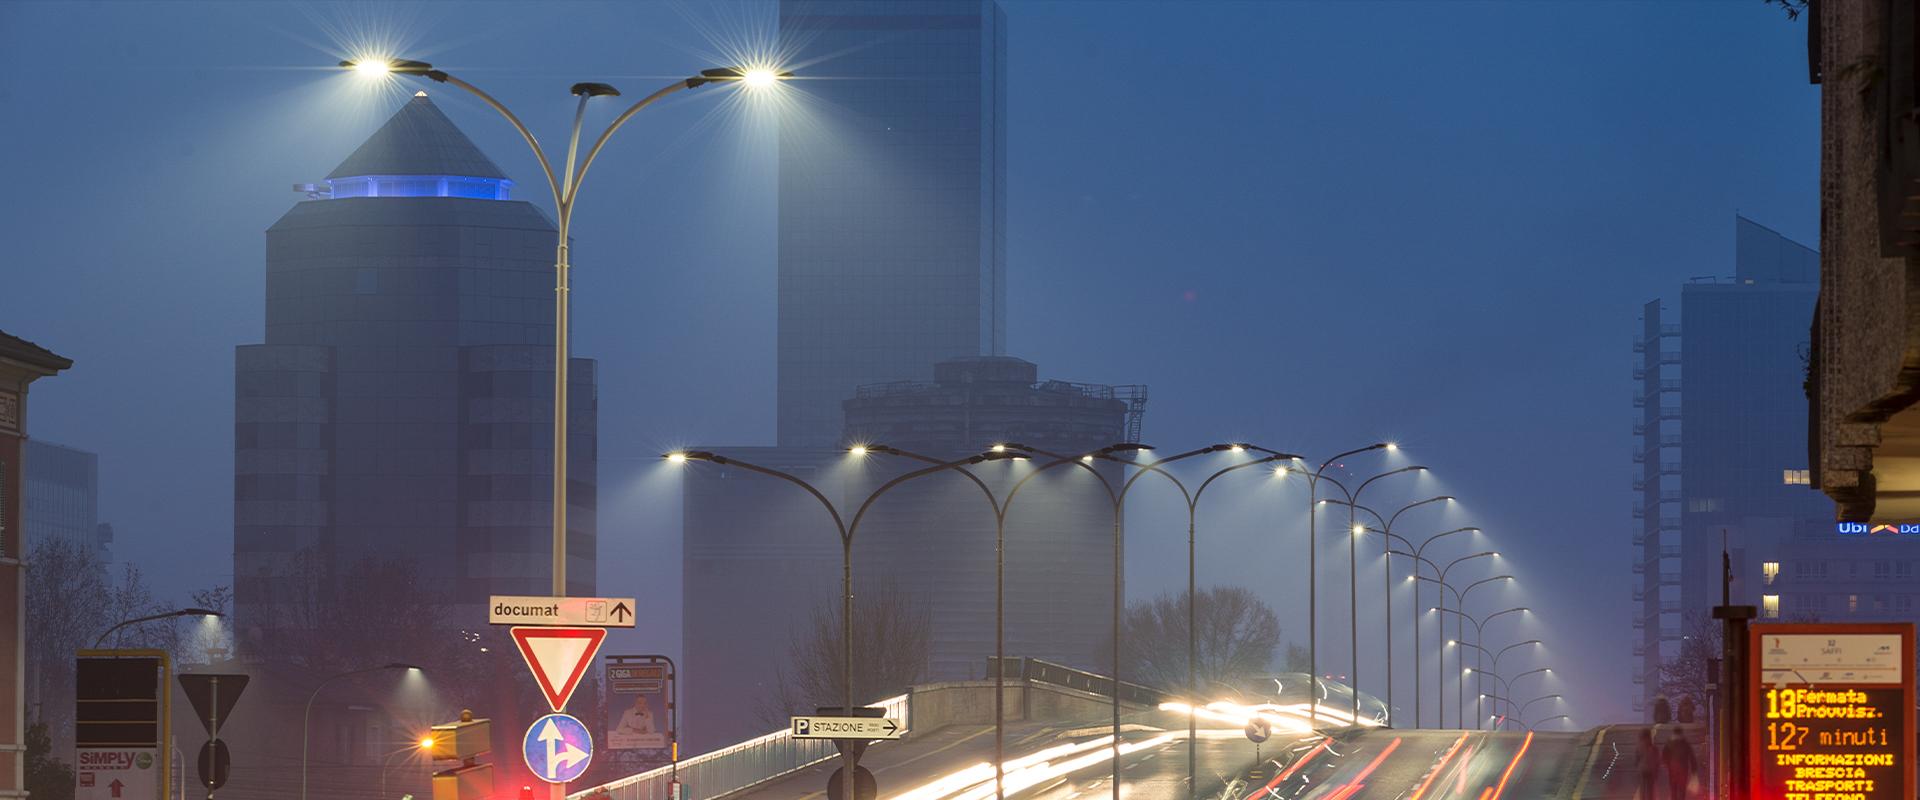 Lampioni a LED